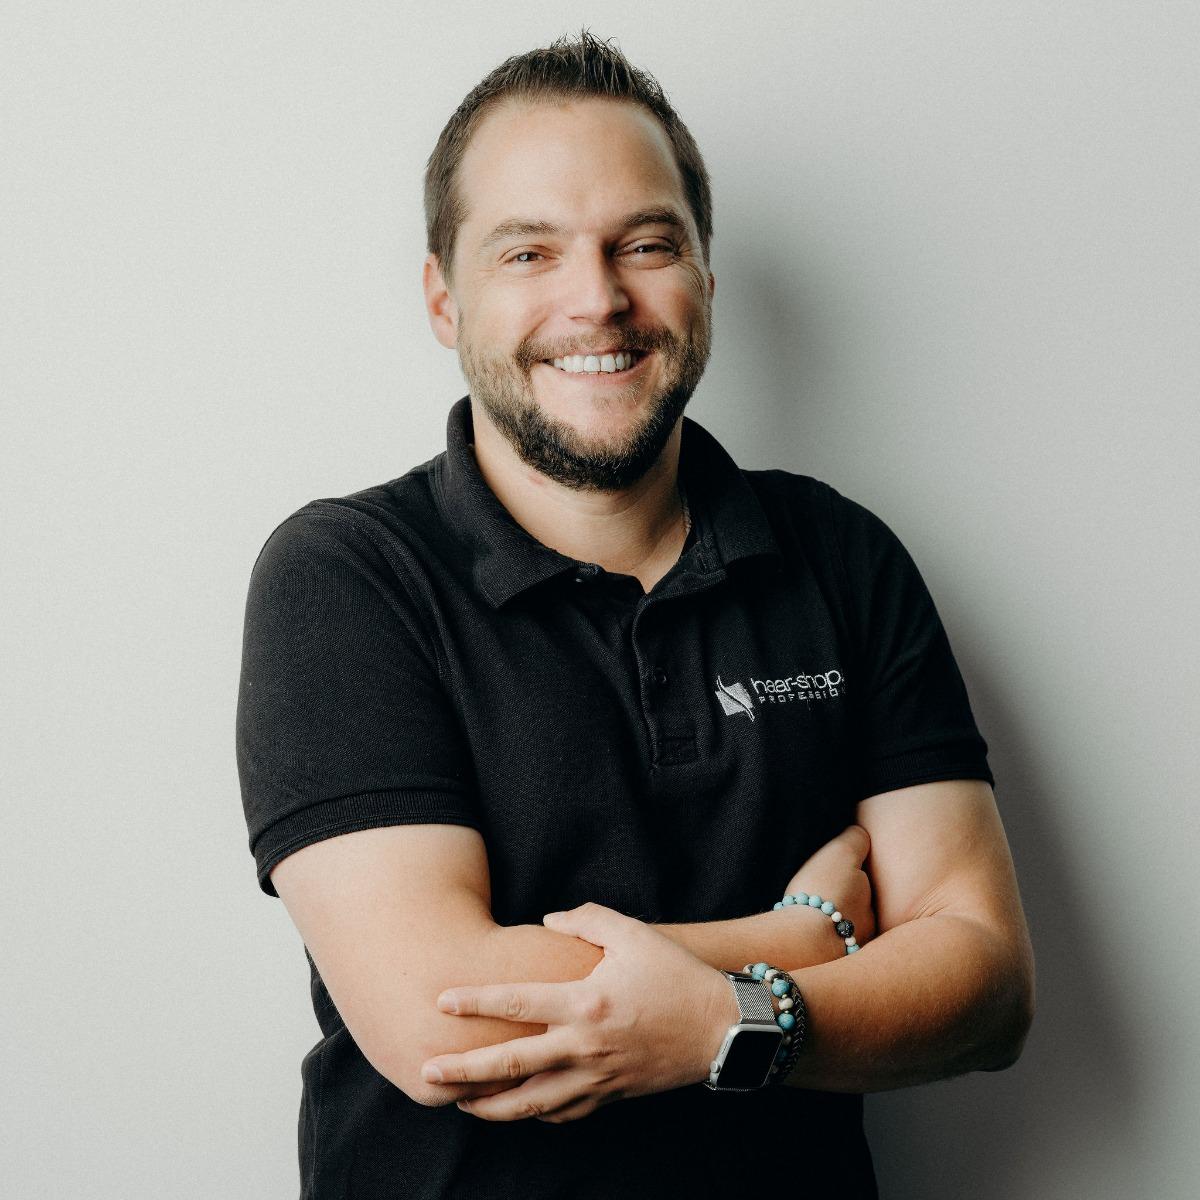 Markus Stoller, IT director